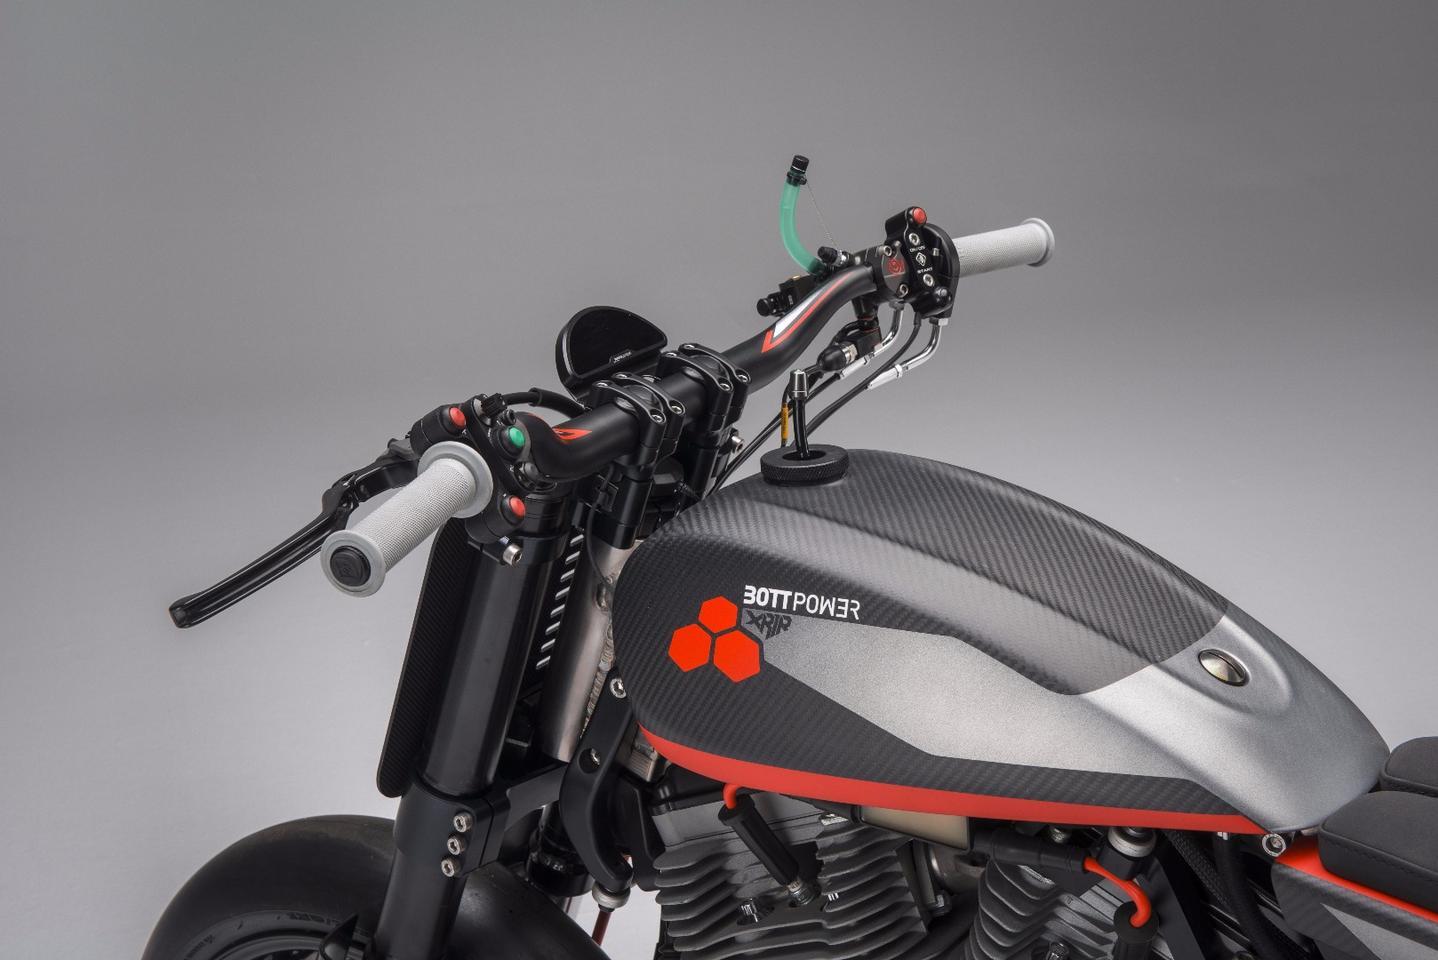 Bottpower's XR1R flat tracker puts the Buell XB12 on a